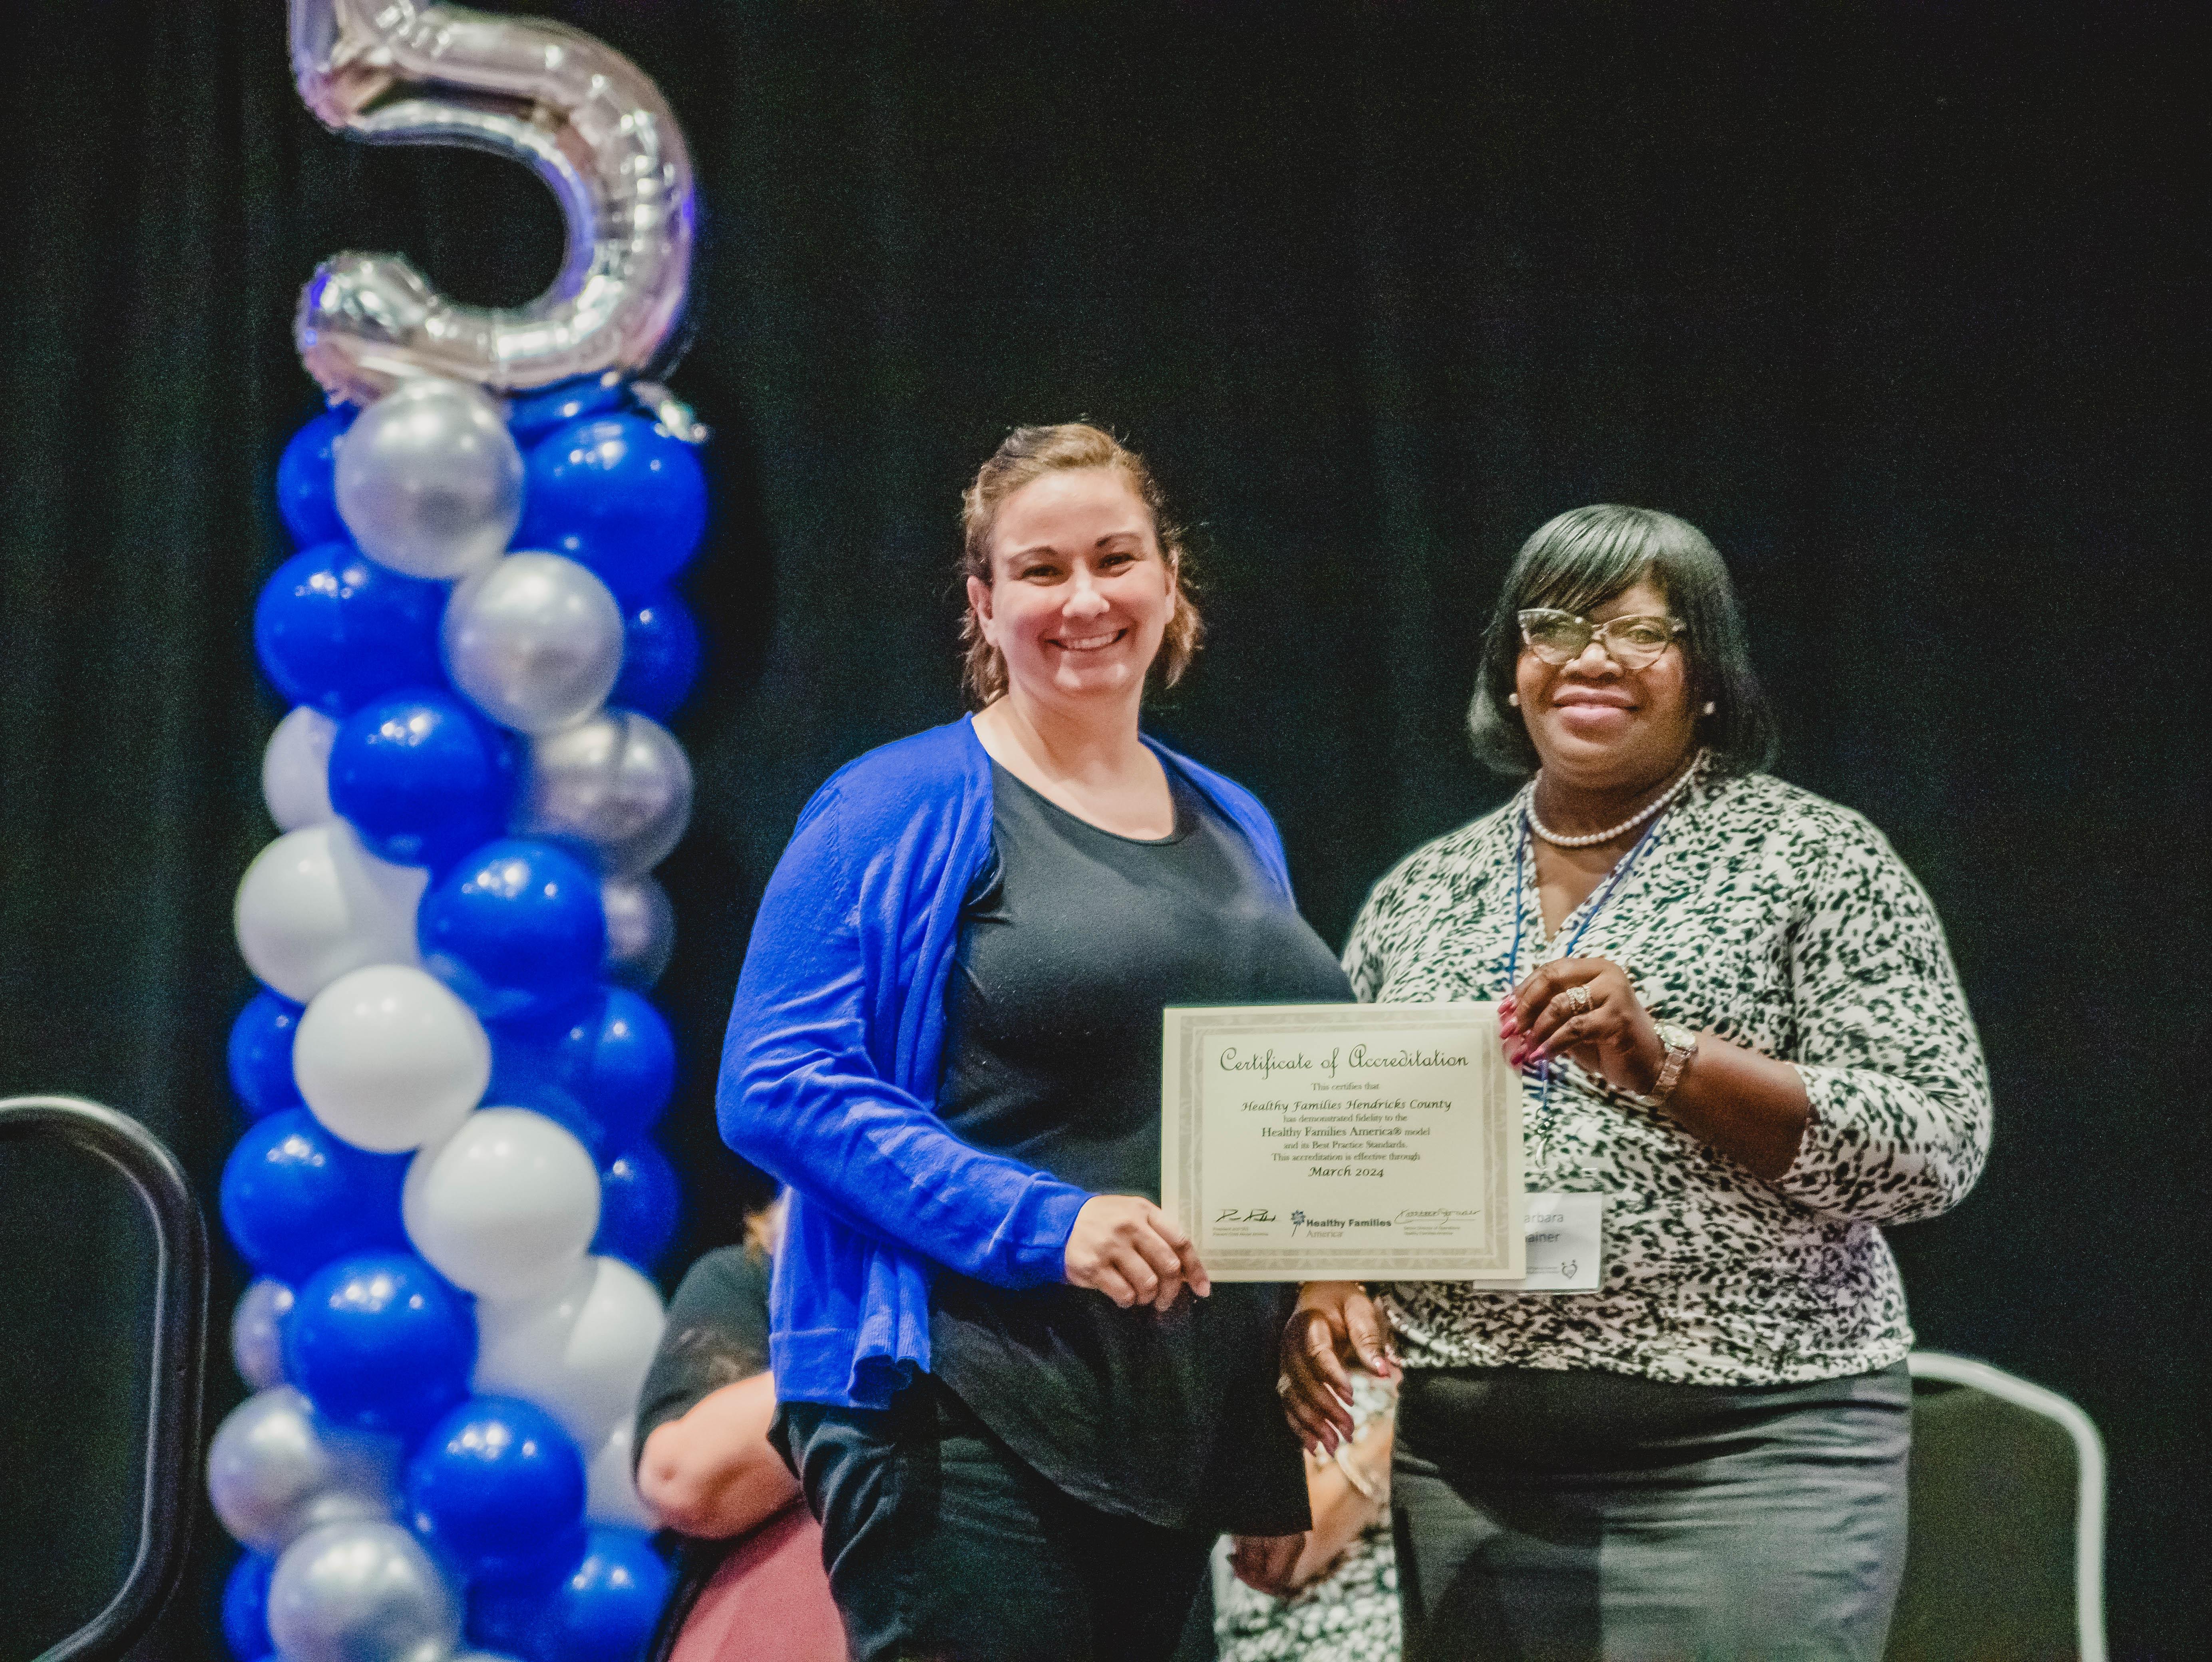 HCCF Awards Grant for Training to Healthy Families Hendricks County